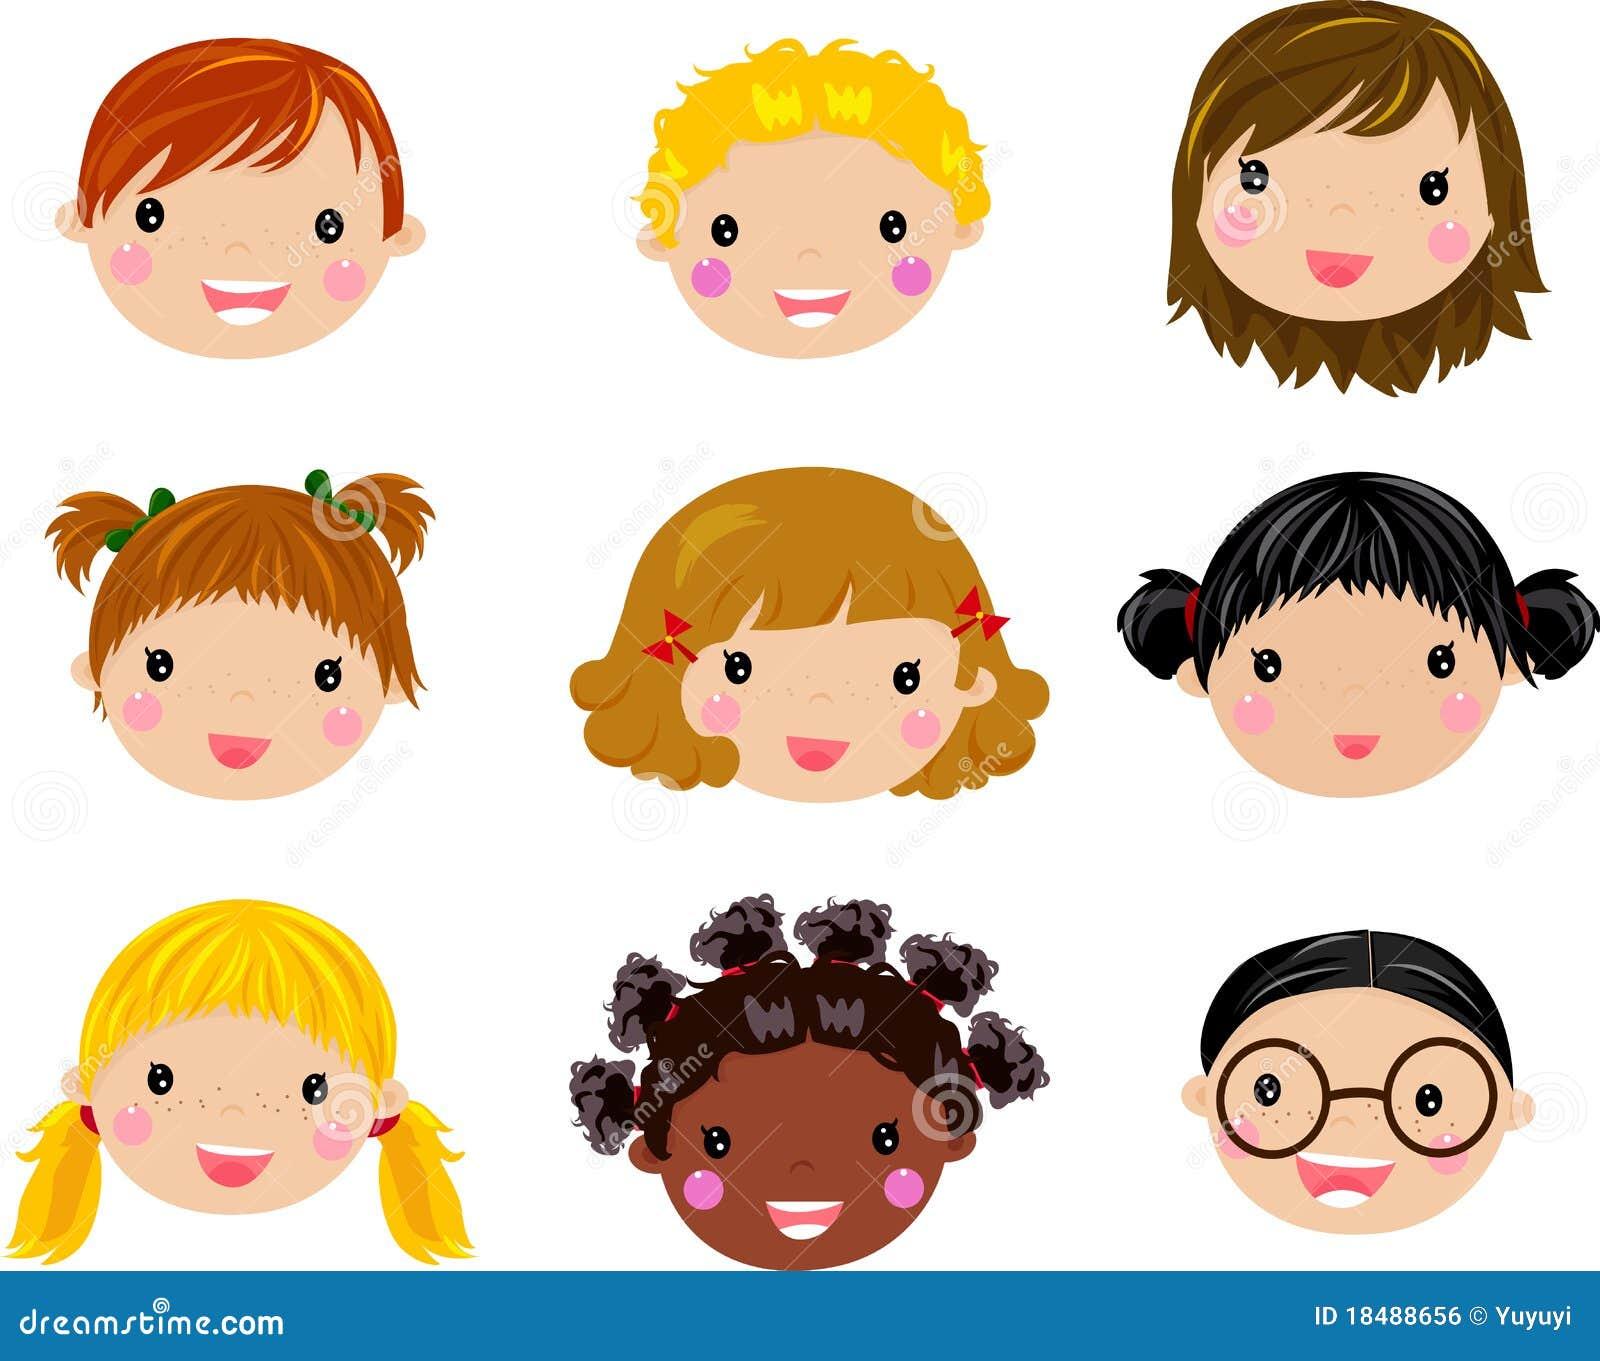 Cartoon Children Face Royalty Free Stock Image - Image: 18488656